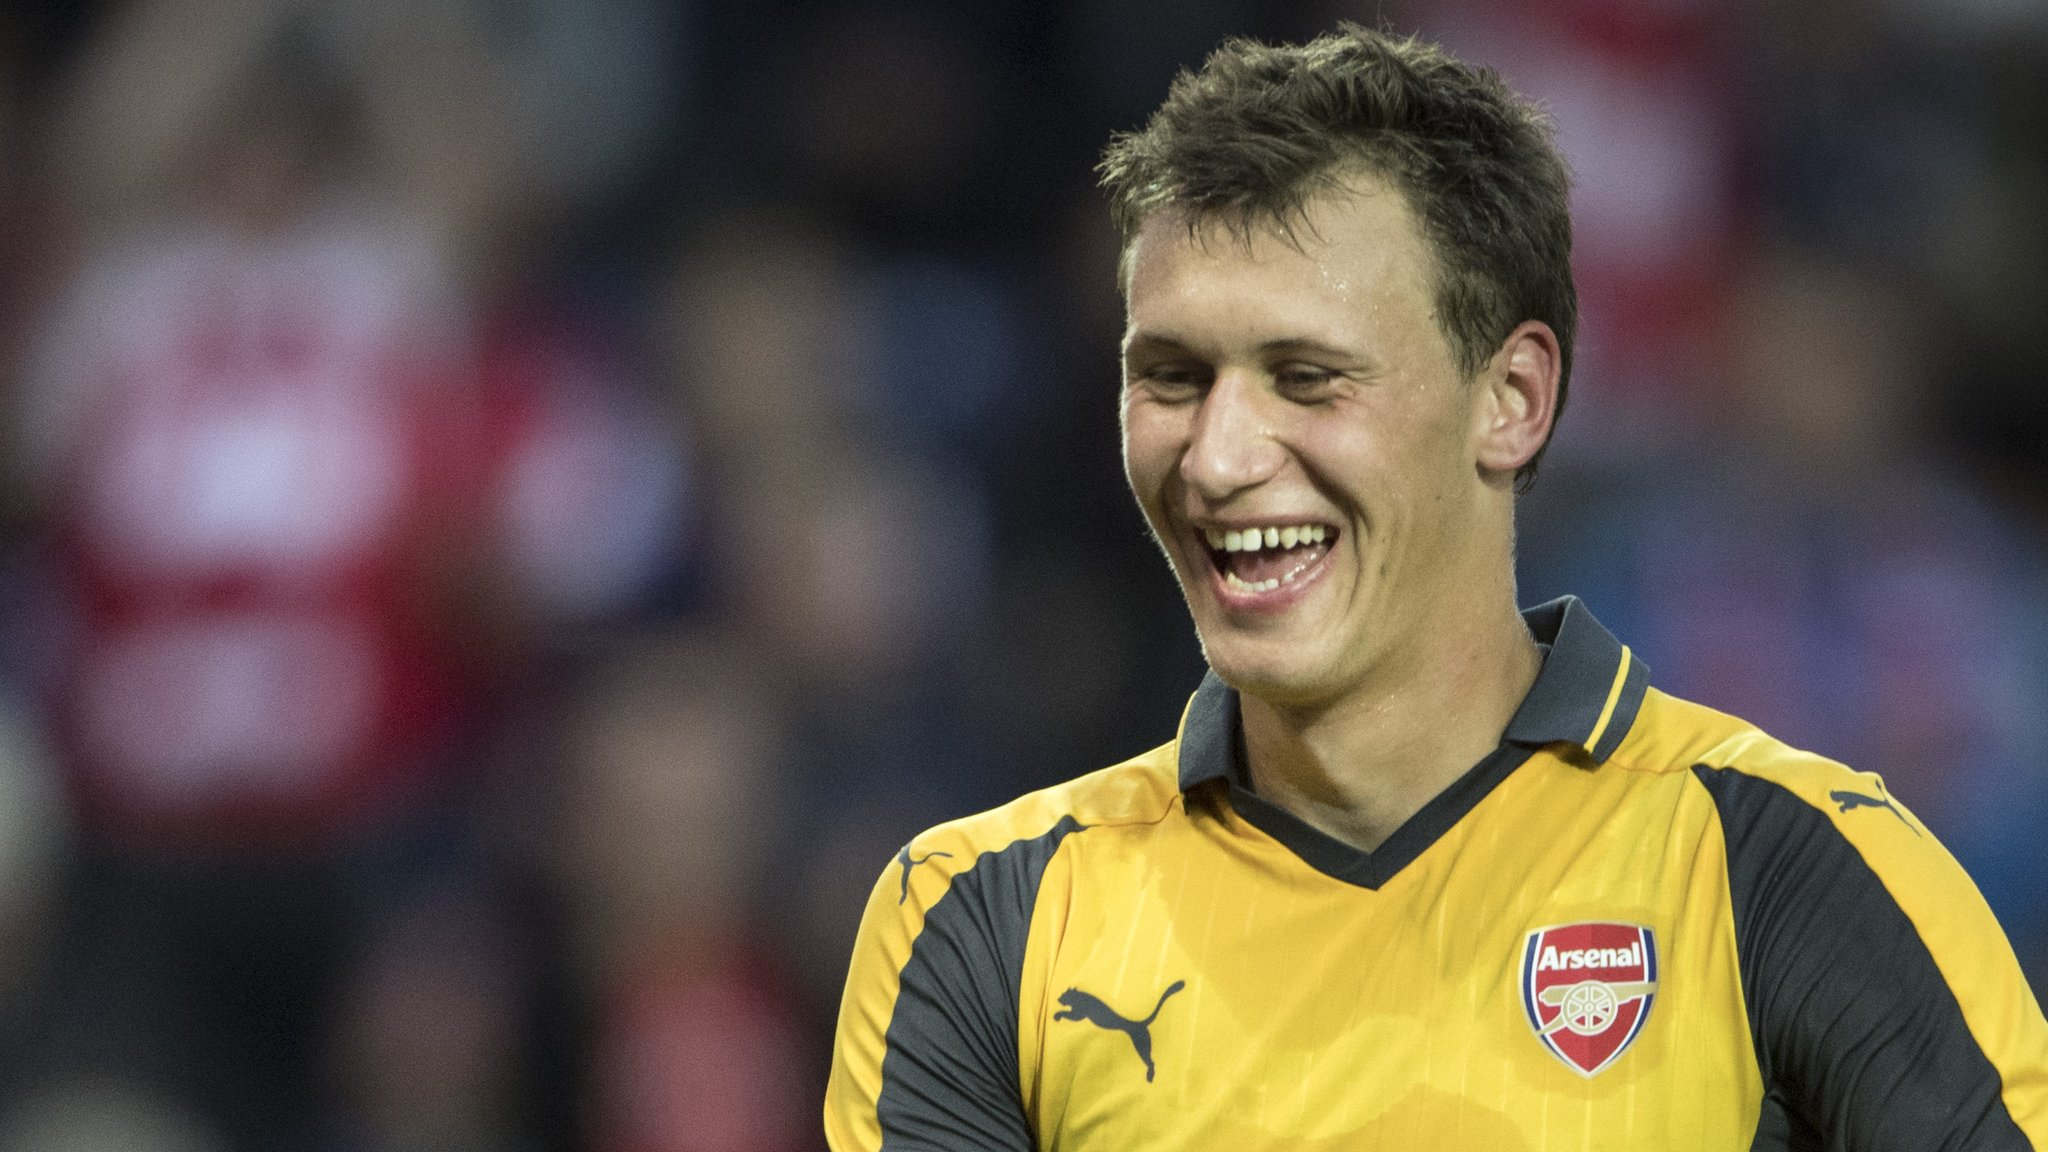 Krystian Bielik: Charlton Athletic sign Arsenal midfielder on loan